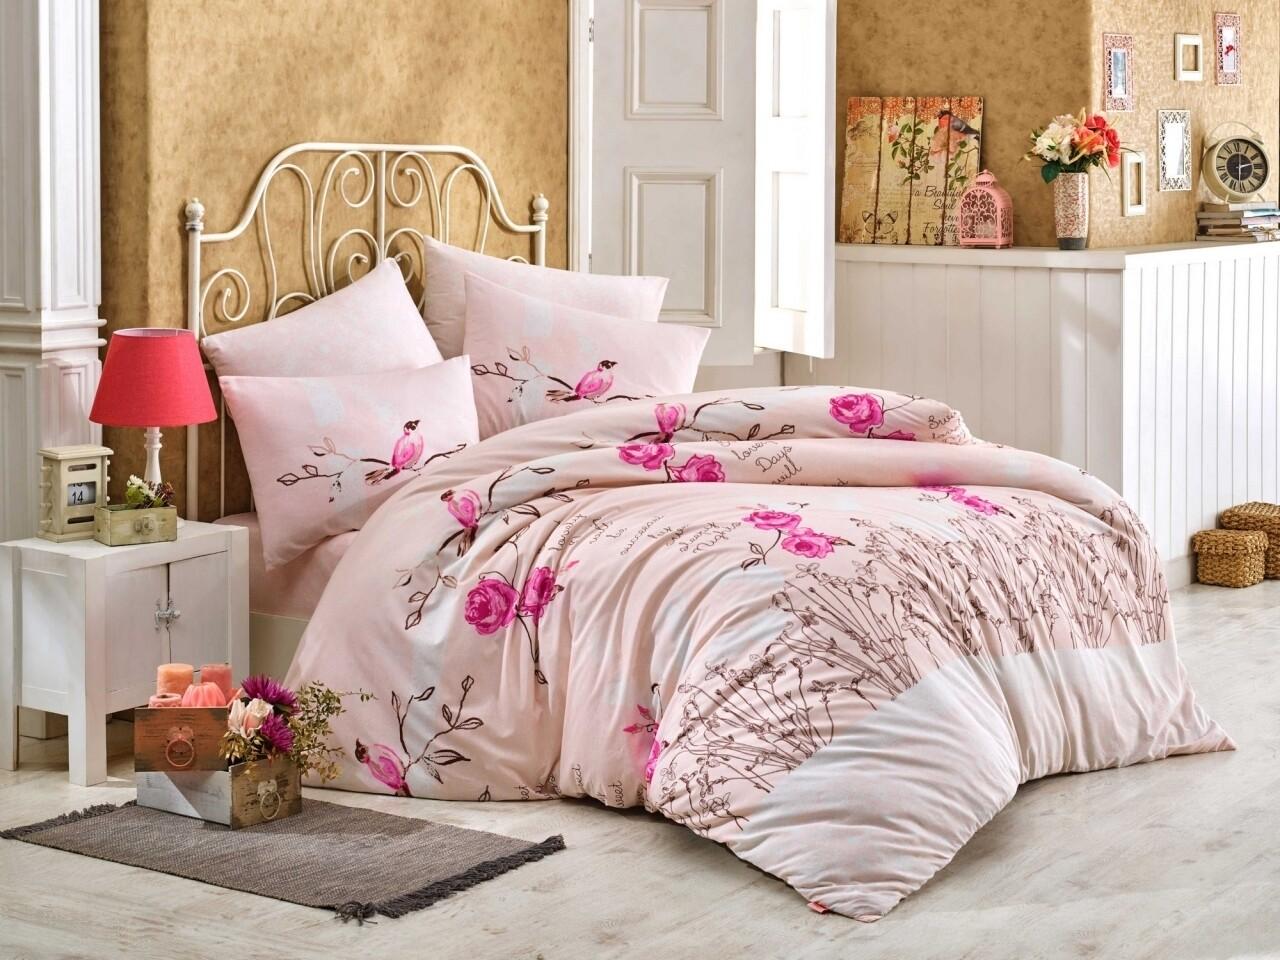 Lenjerie de pat pentru o persoana, 3 piese, 100% bumbac ranforce, Hobby, Lidia, roz